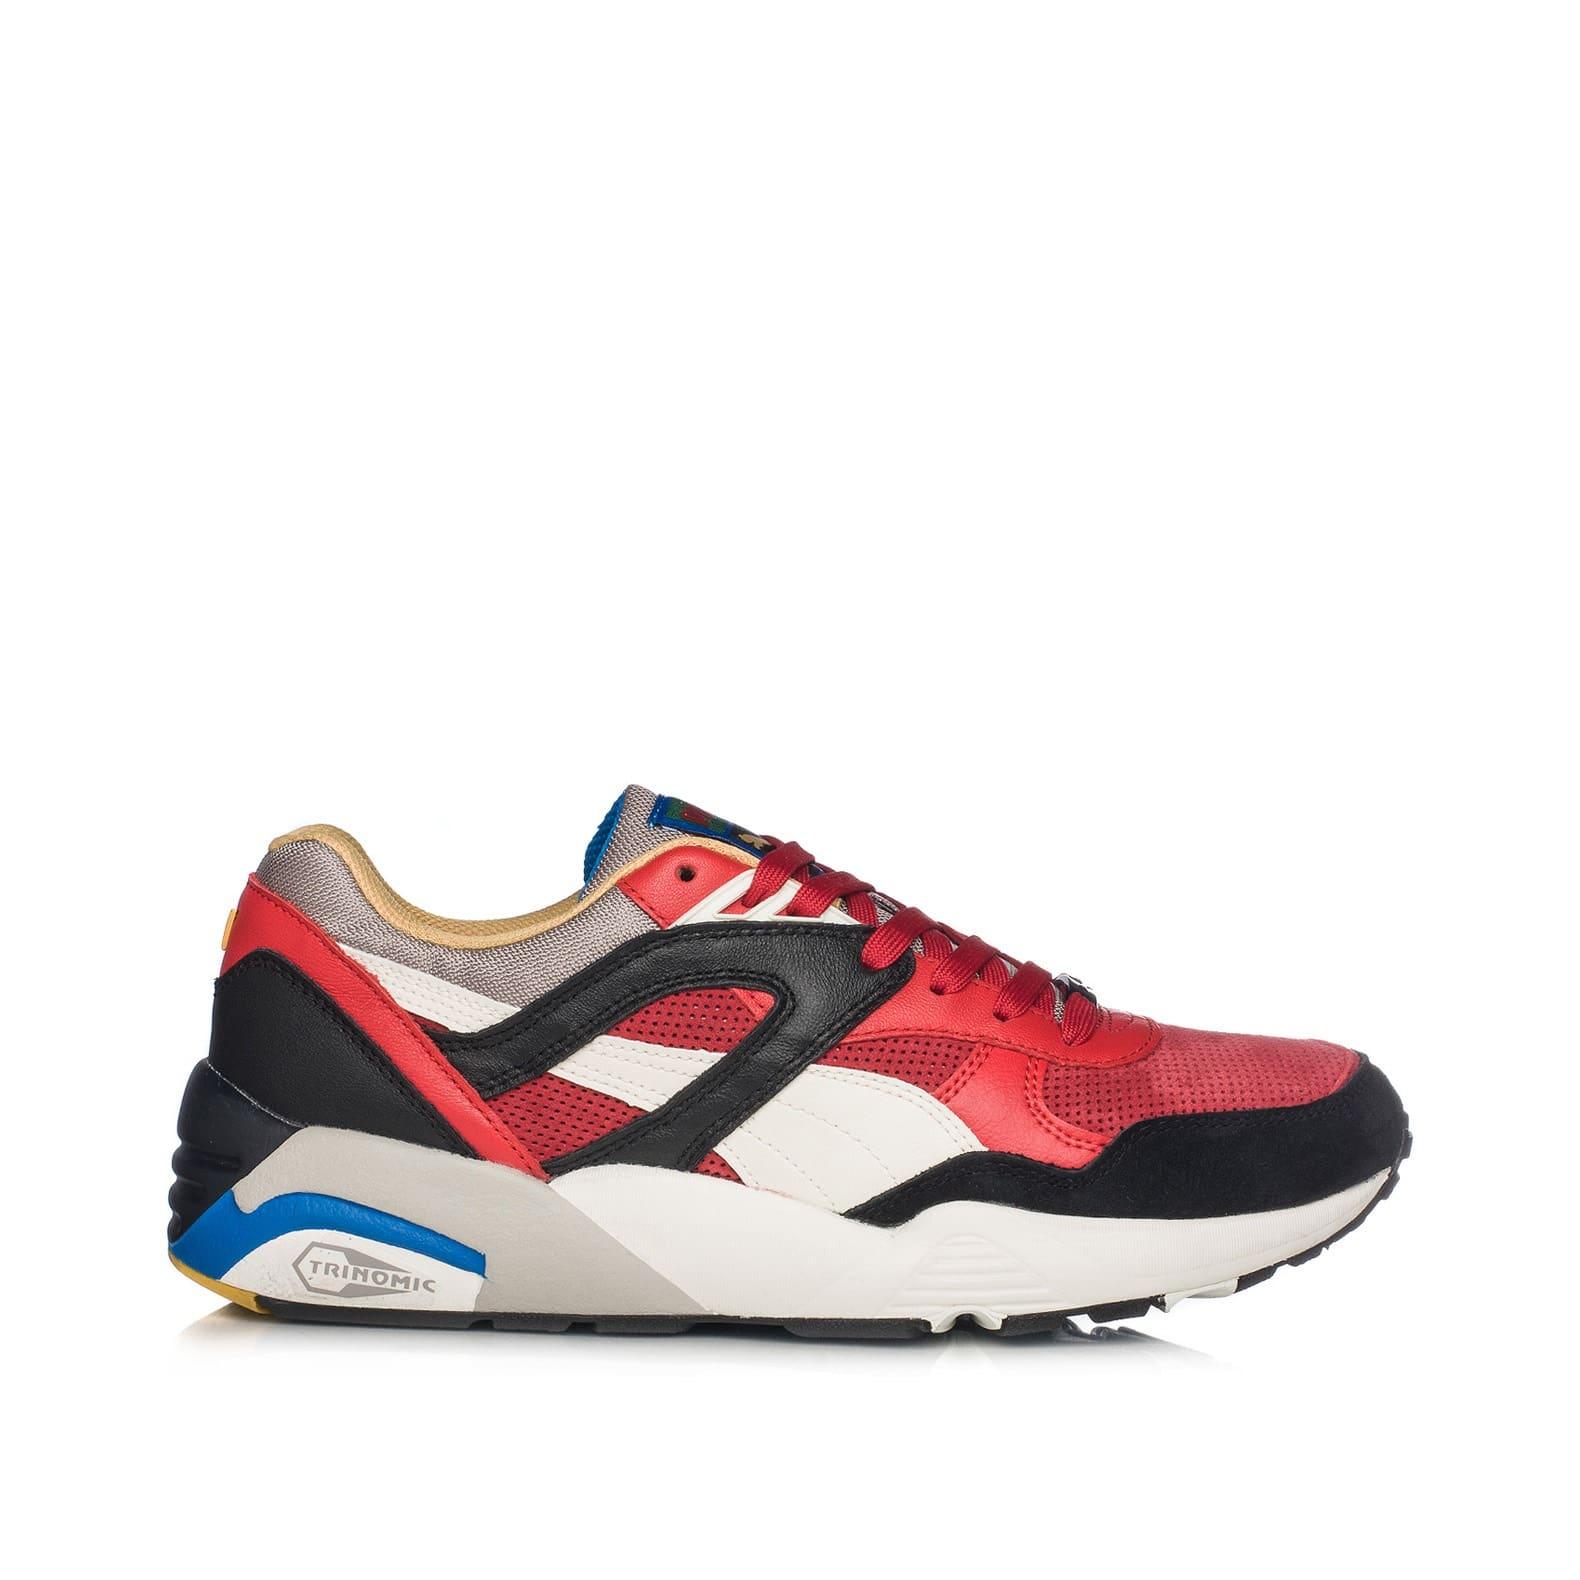 puma-r698-flag-pack-red-black-361450-03